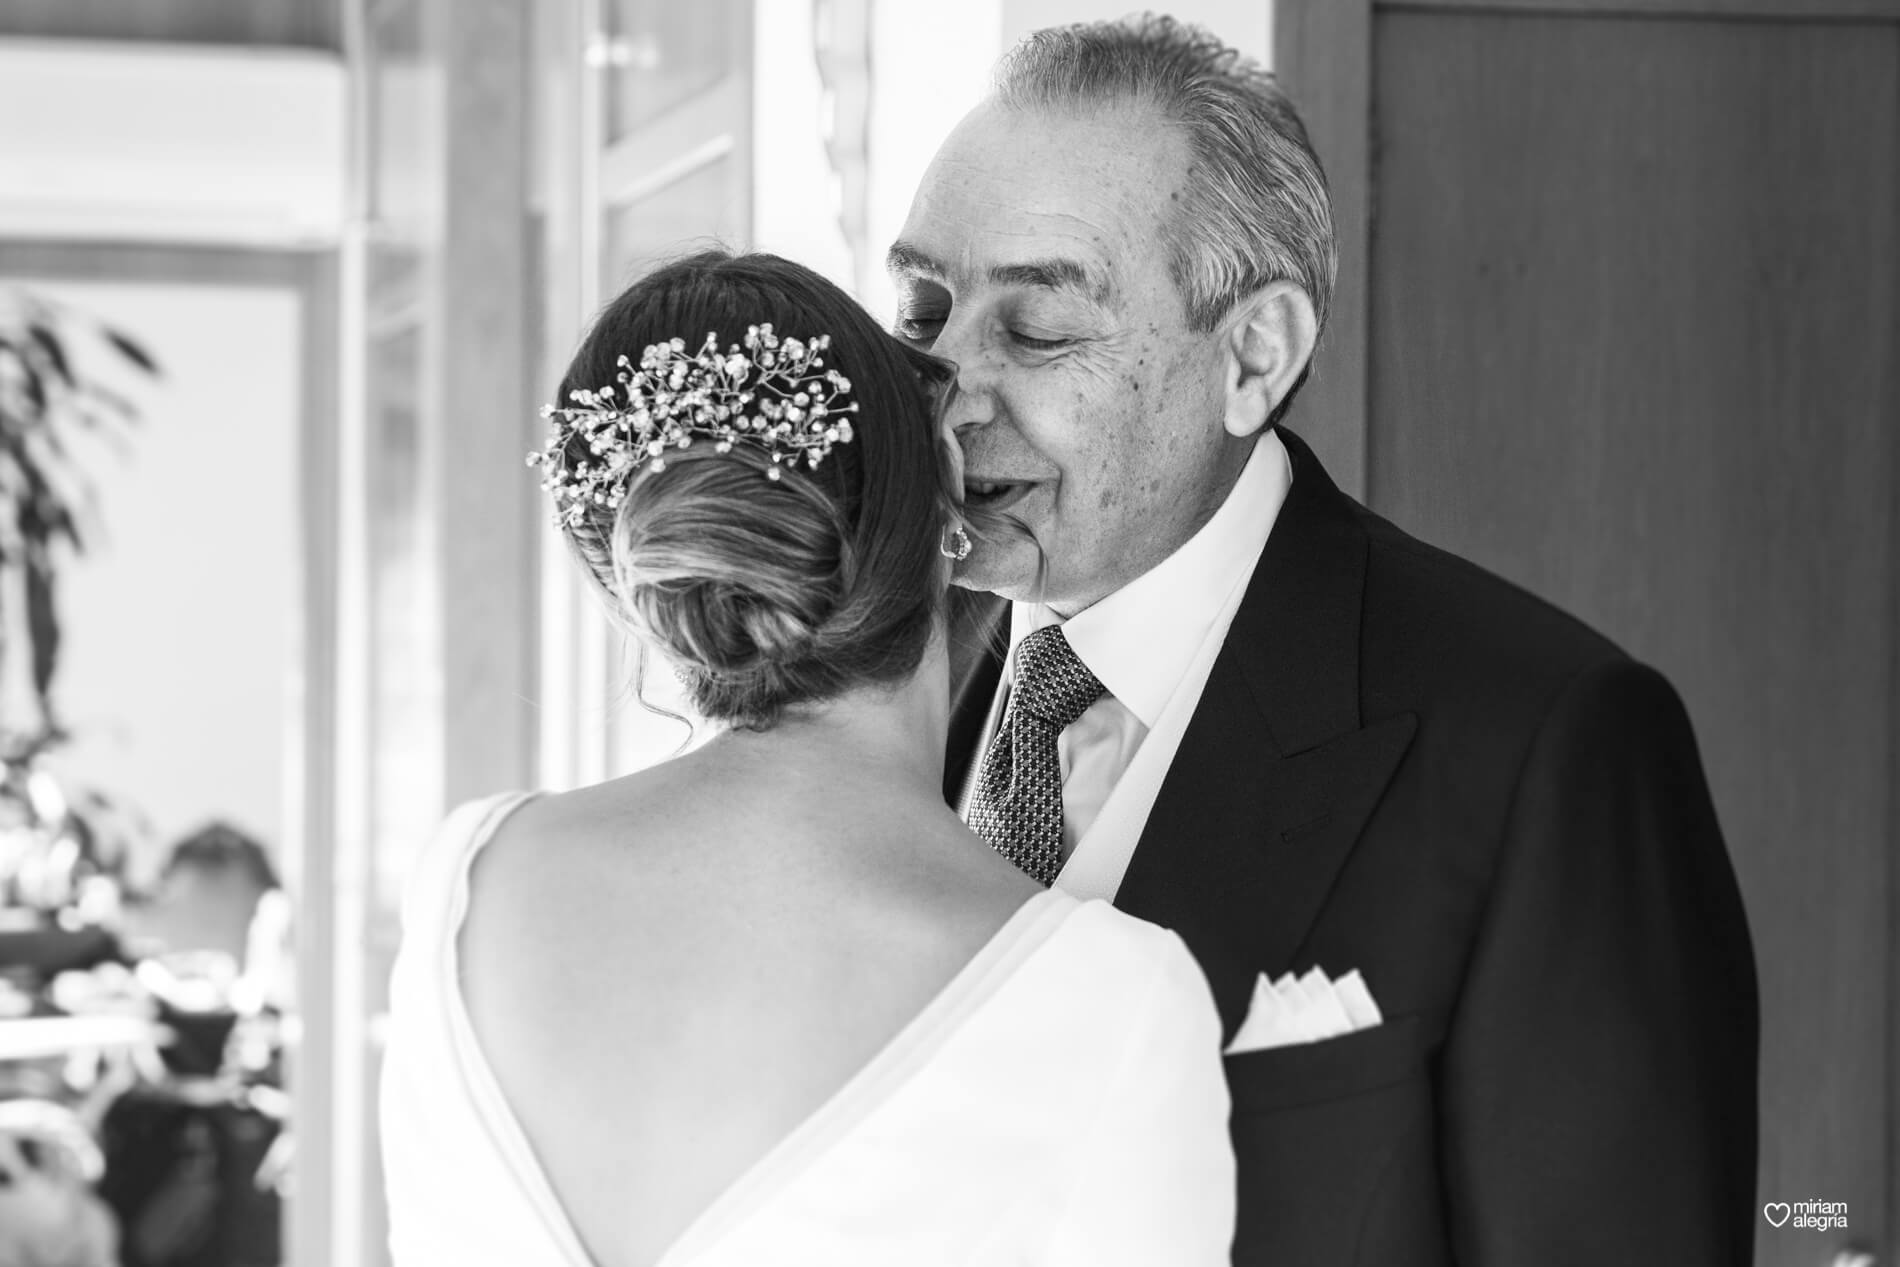 vestido-de-novia-paula-del-vas-miriam-alegria-fotografos-boda-murcia-26